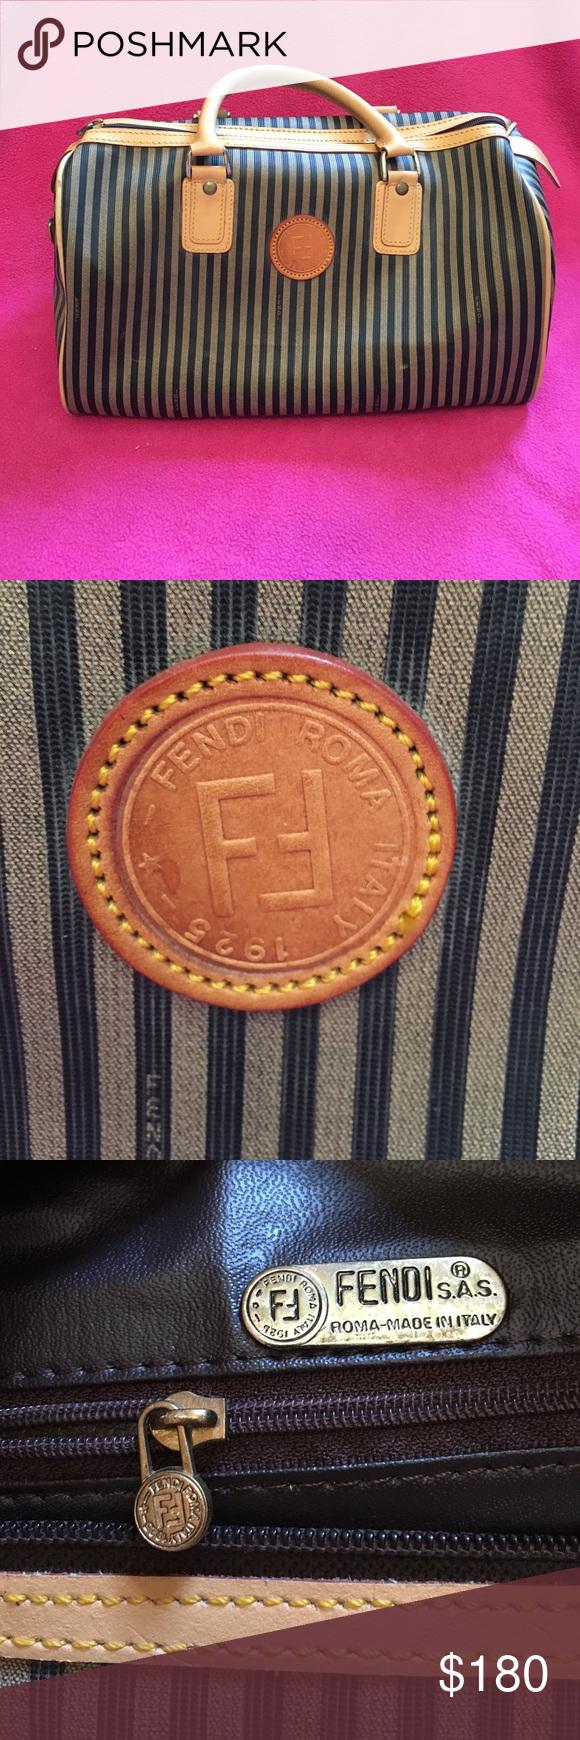 137d21b7642c Vintage Fendi Roma Italy 1925 purse Measures 13